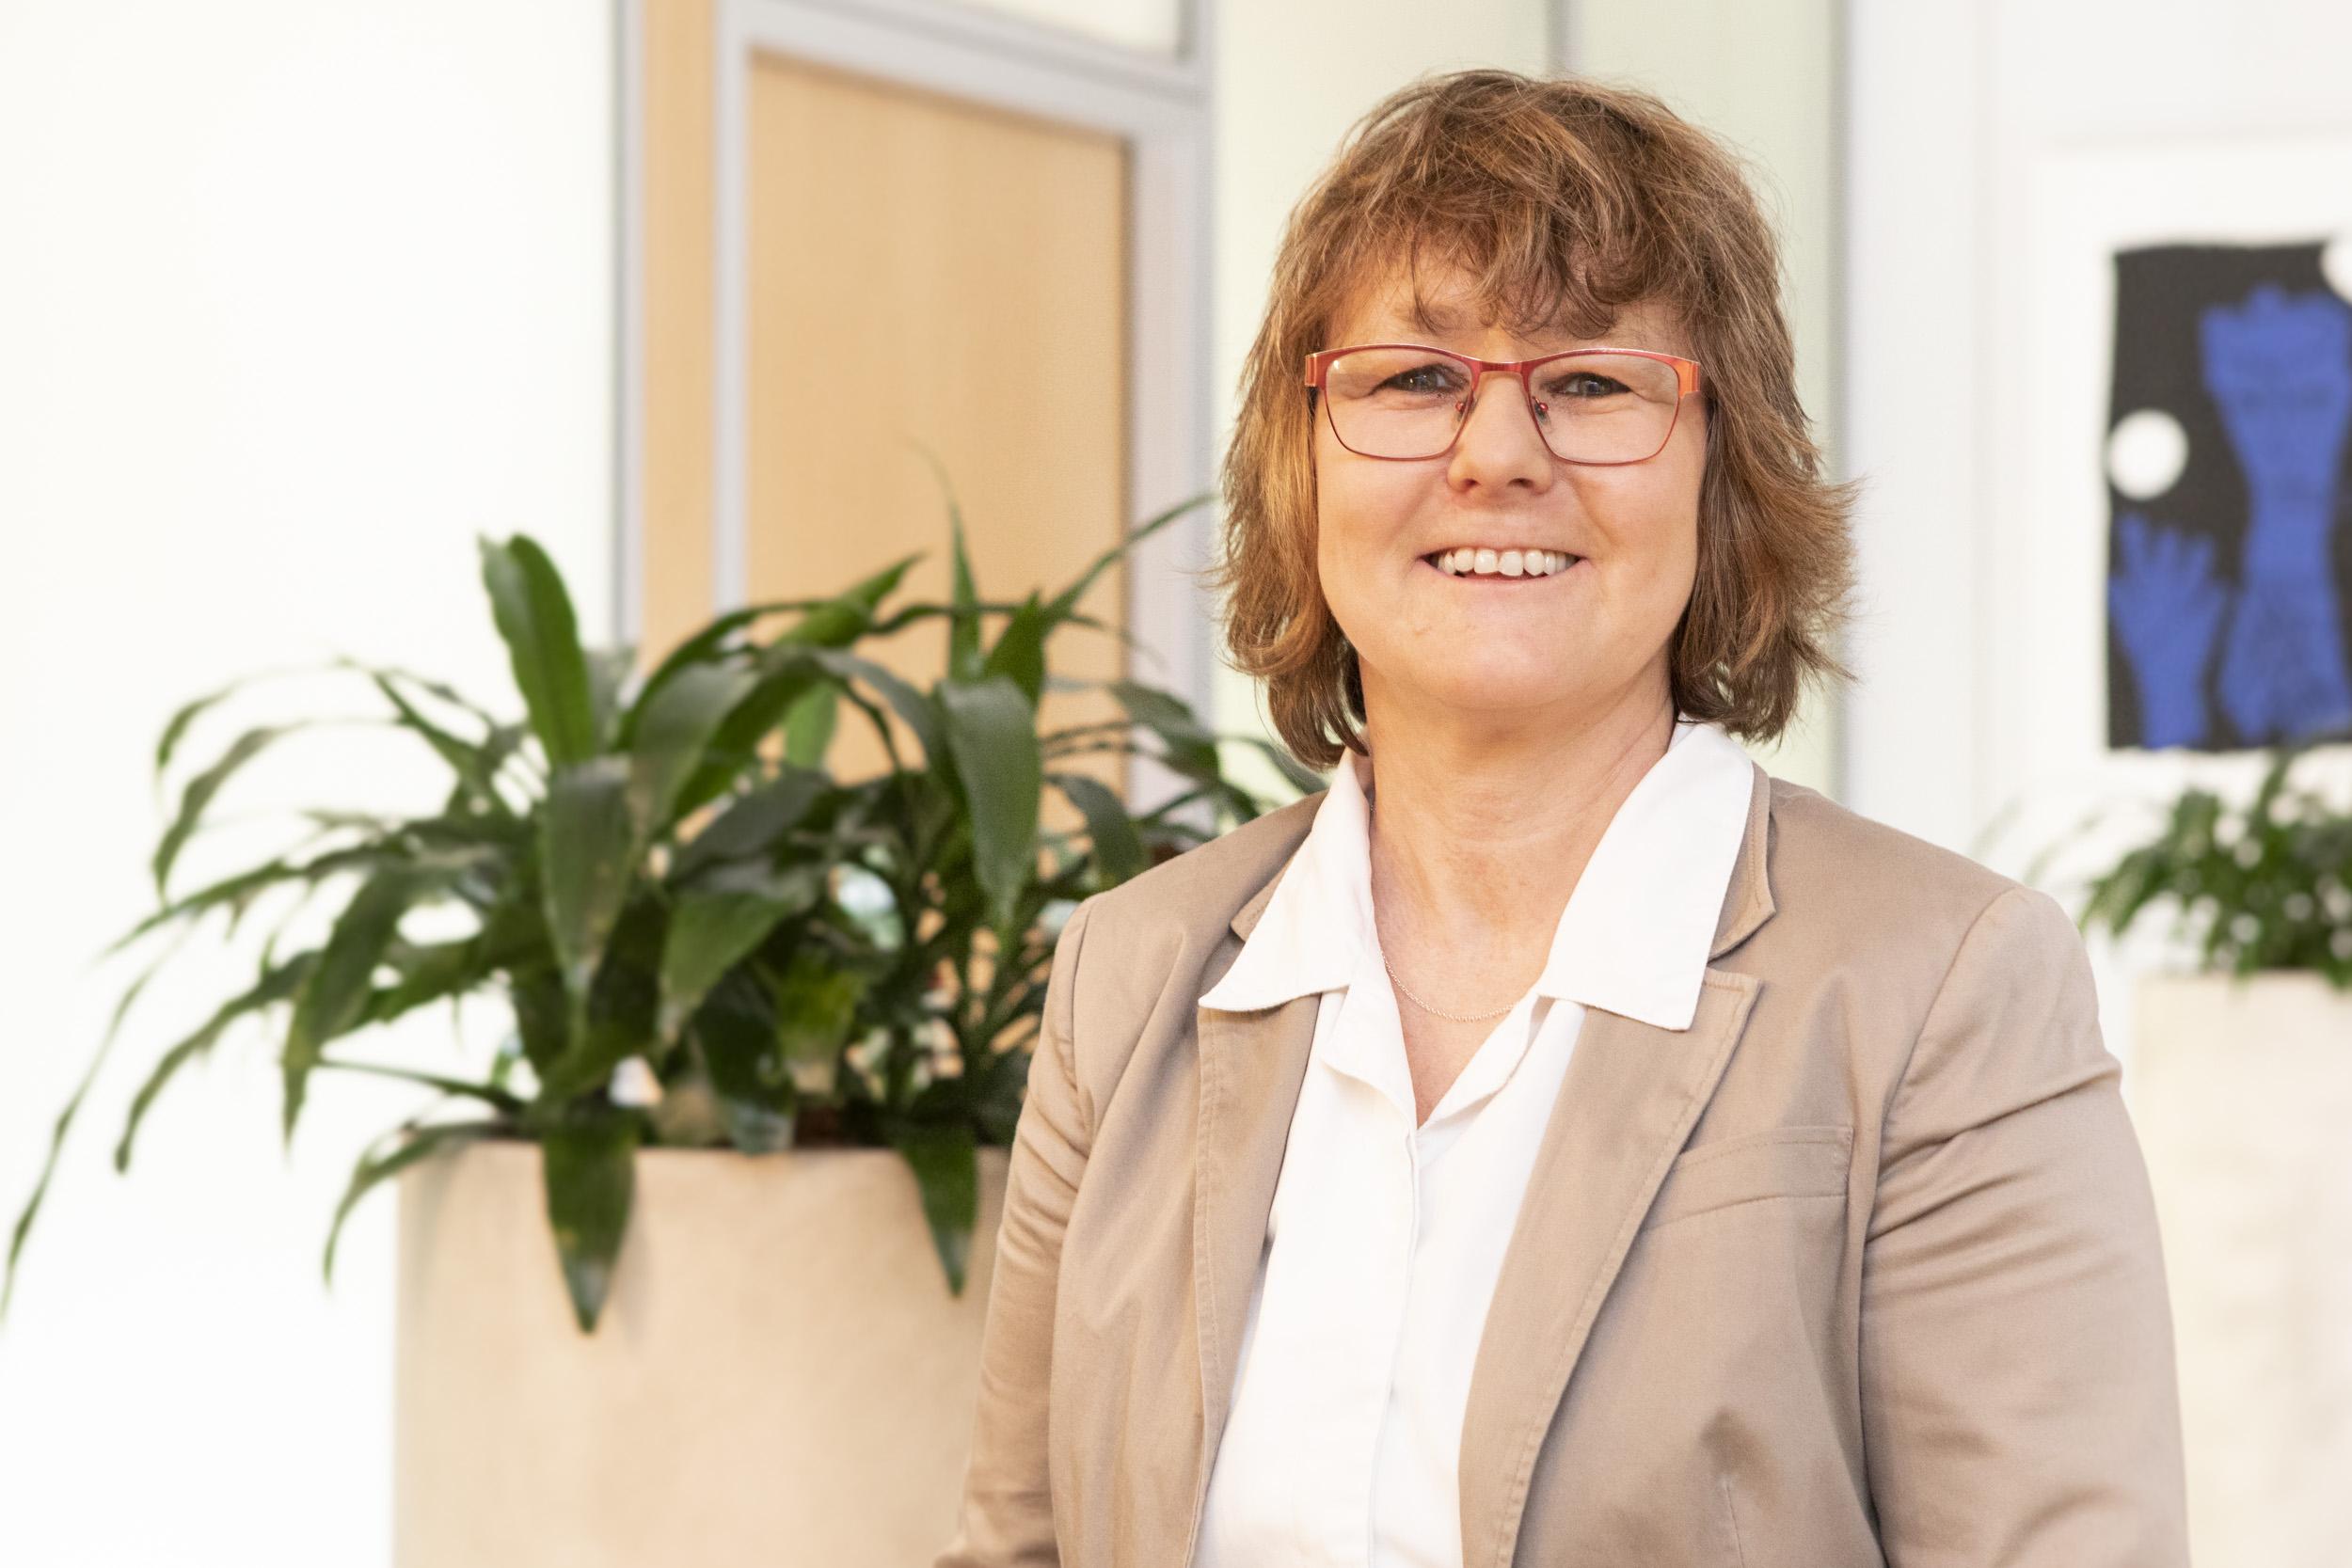 Karin Weithofer